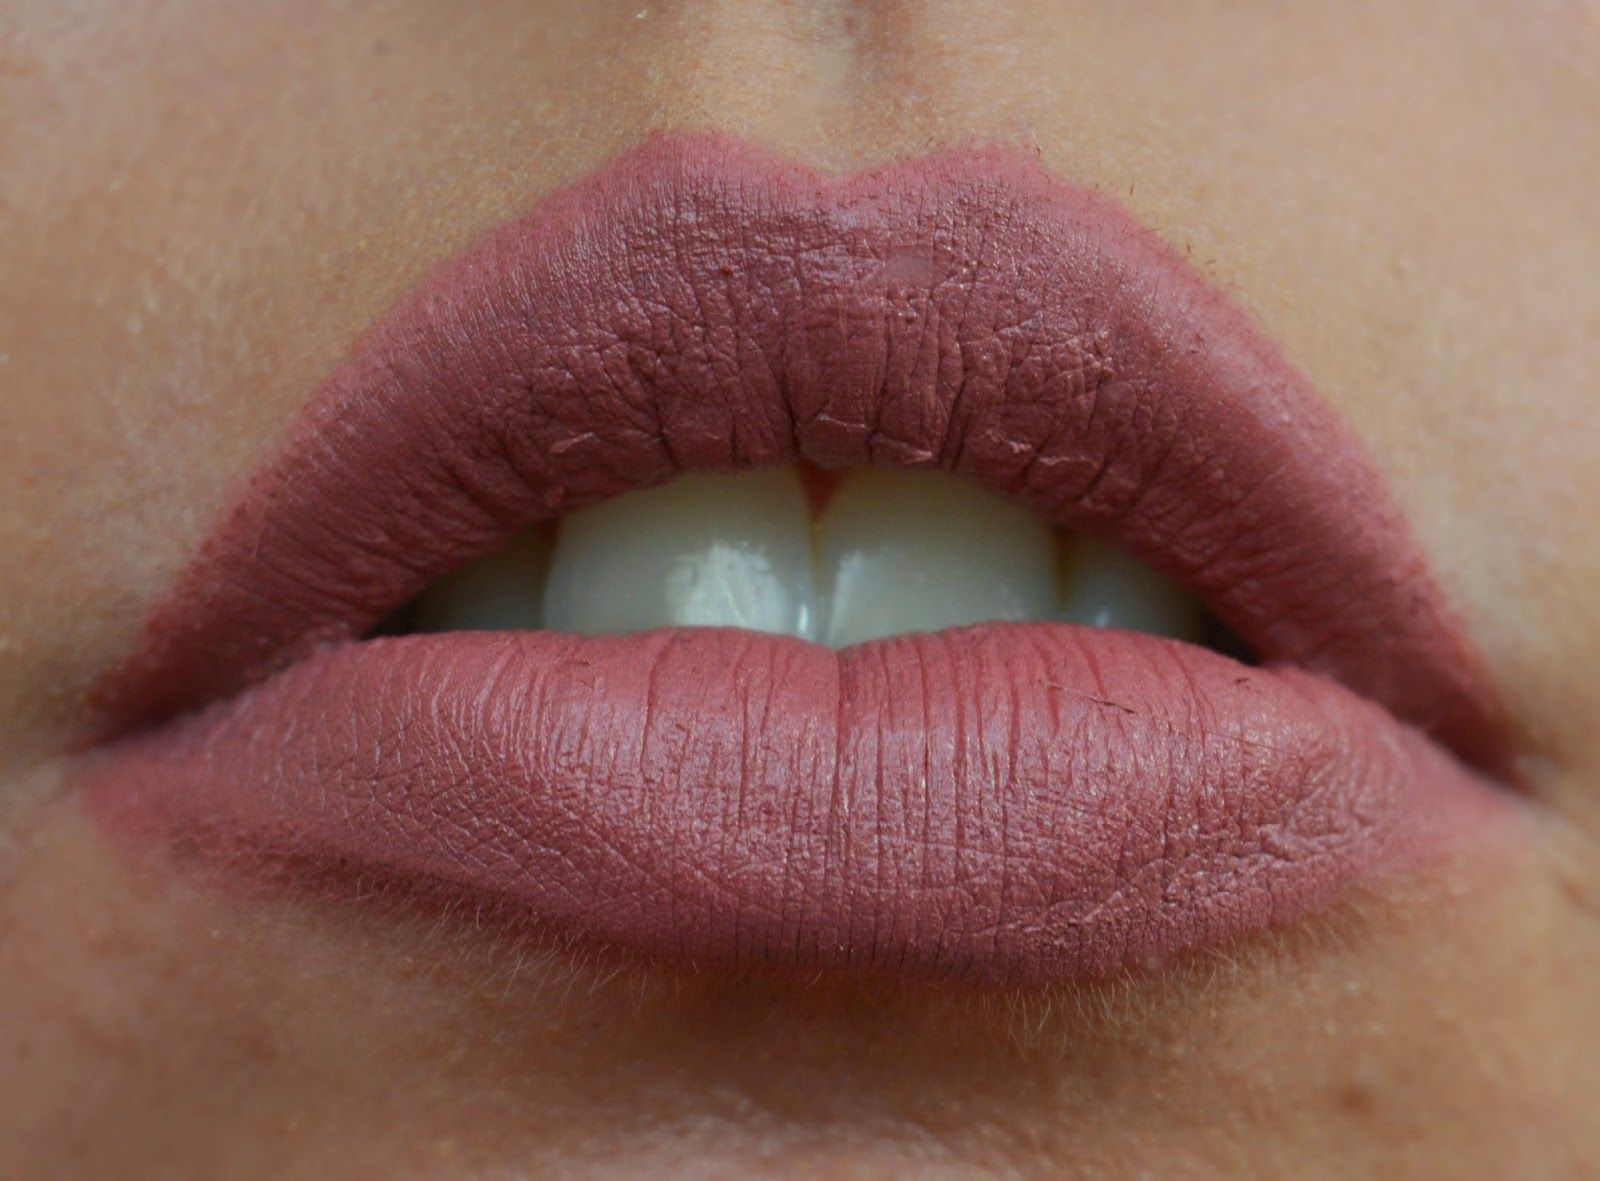 The Kylie Jenner Lip MAC Twig Lipstick The Kylie Jenner